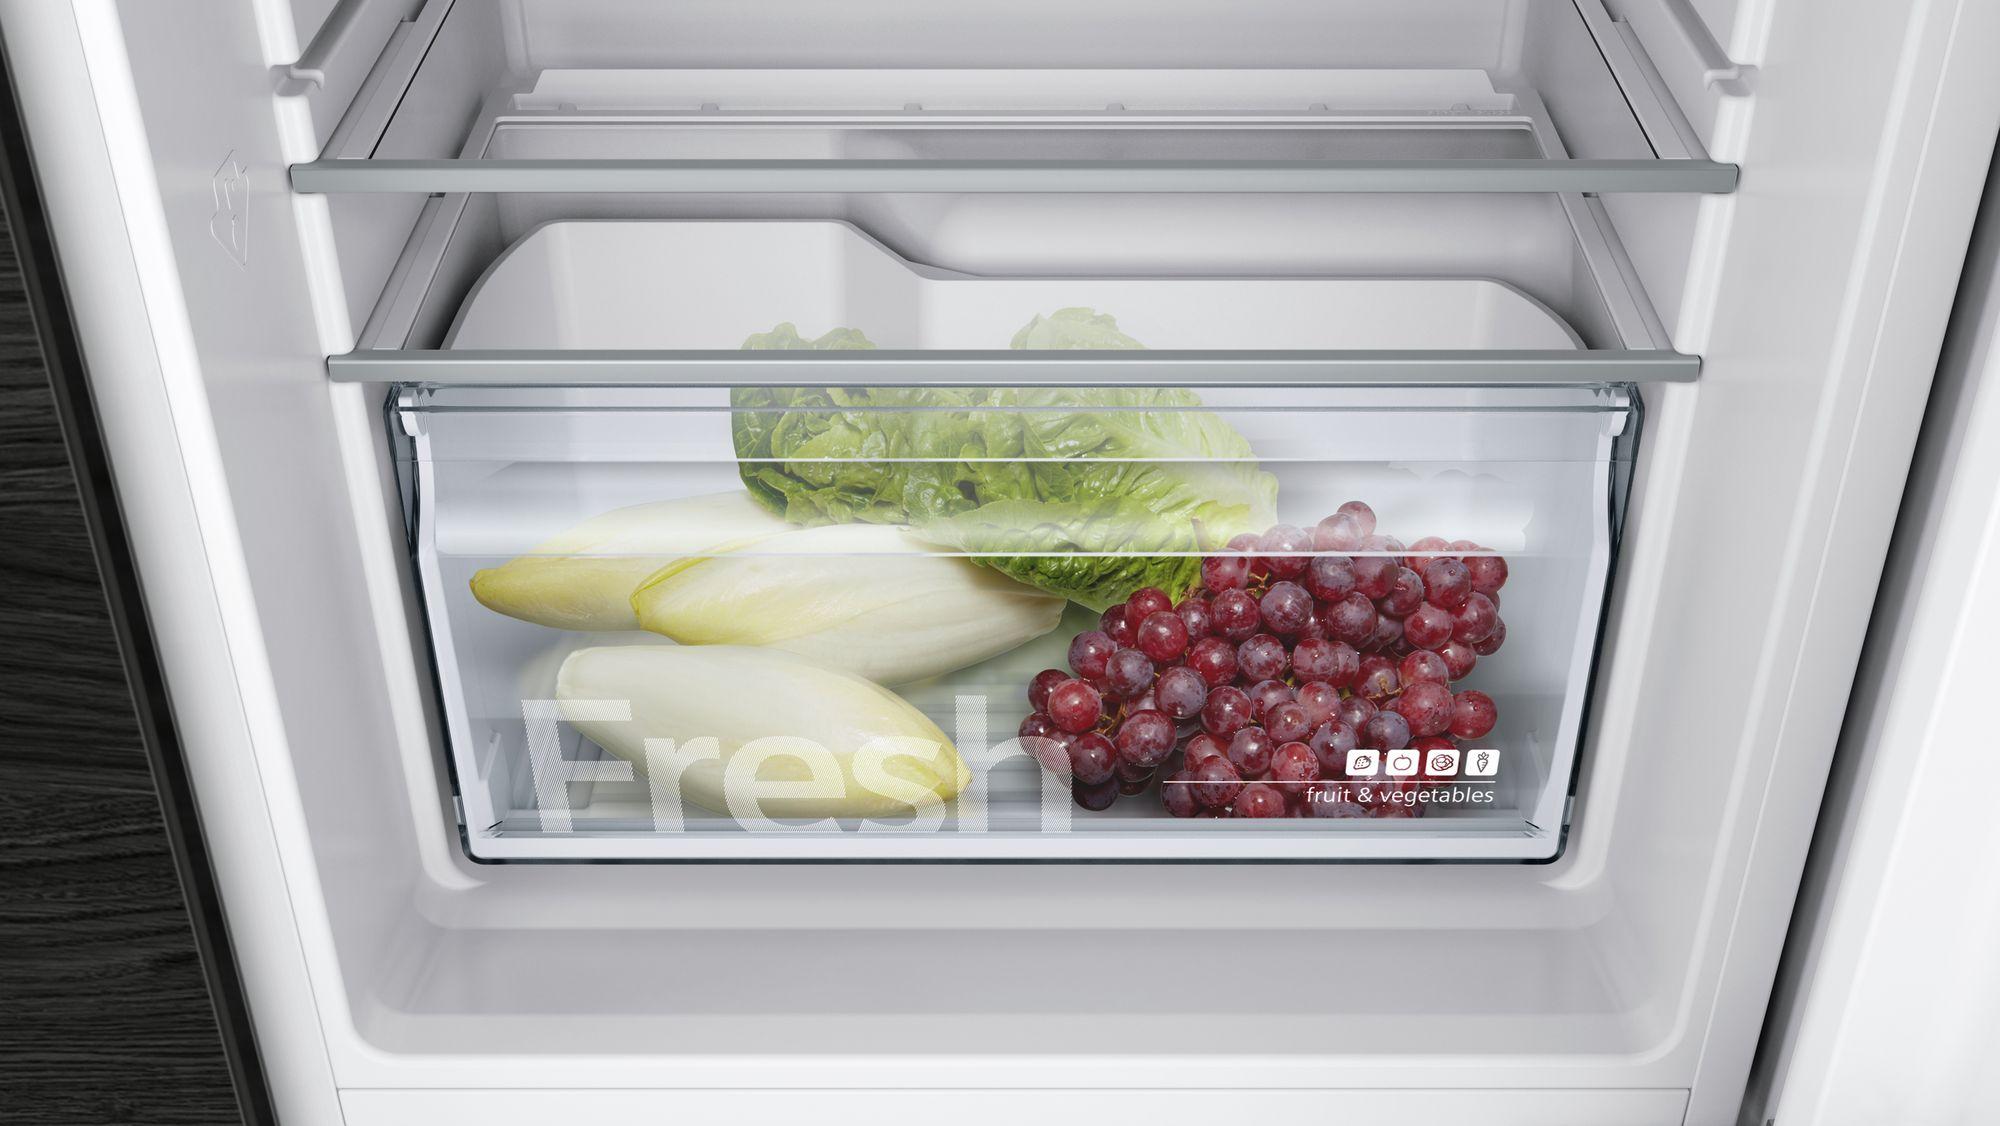 Siemens Kühlschrank : Siemens einbau kühlschrank flachscharnier technik ki lvf